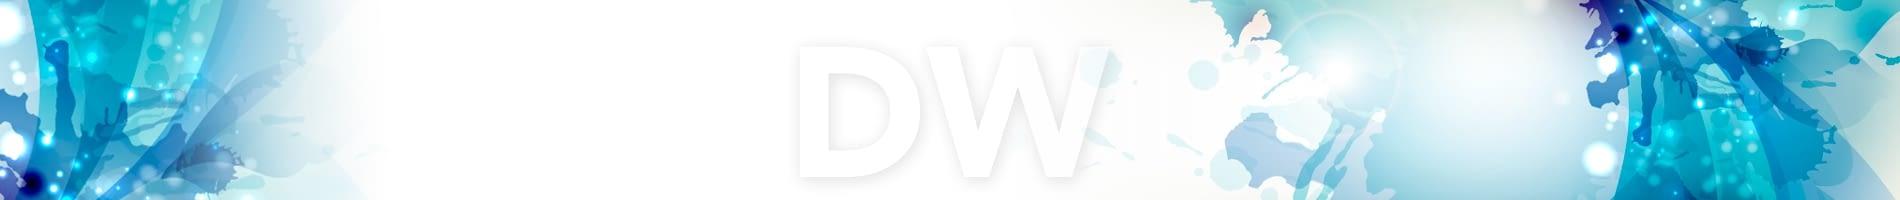 Banner - Disseny web